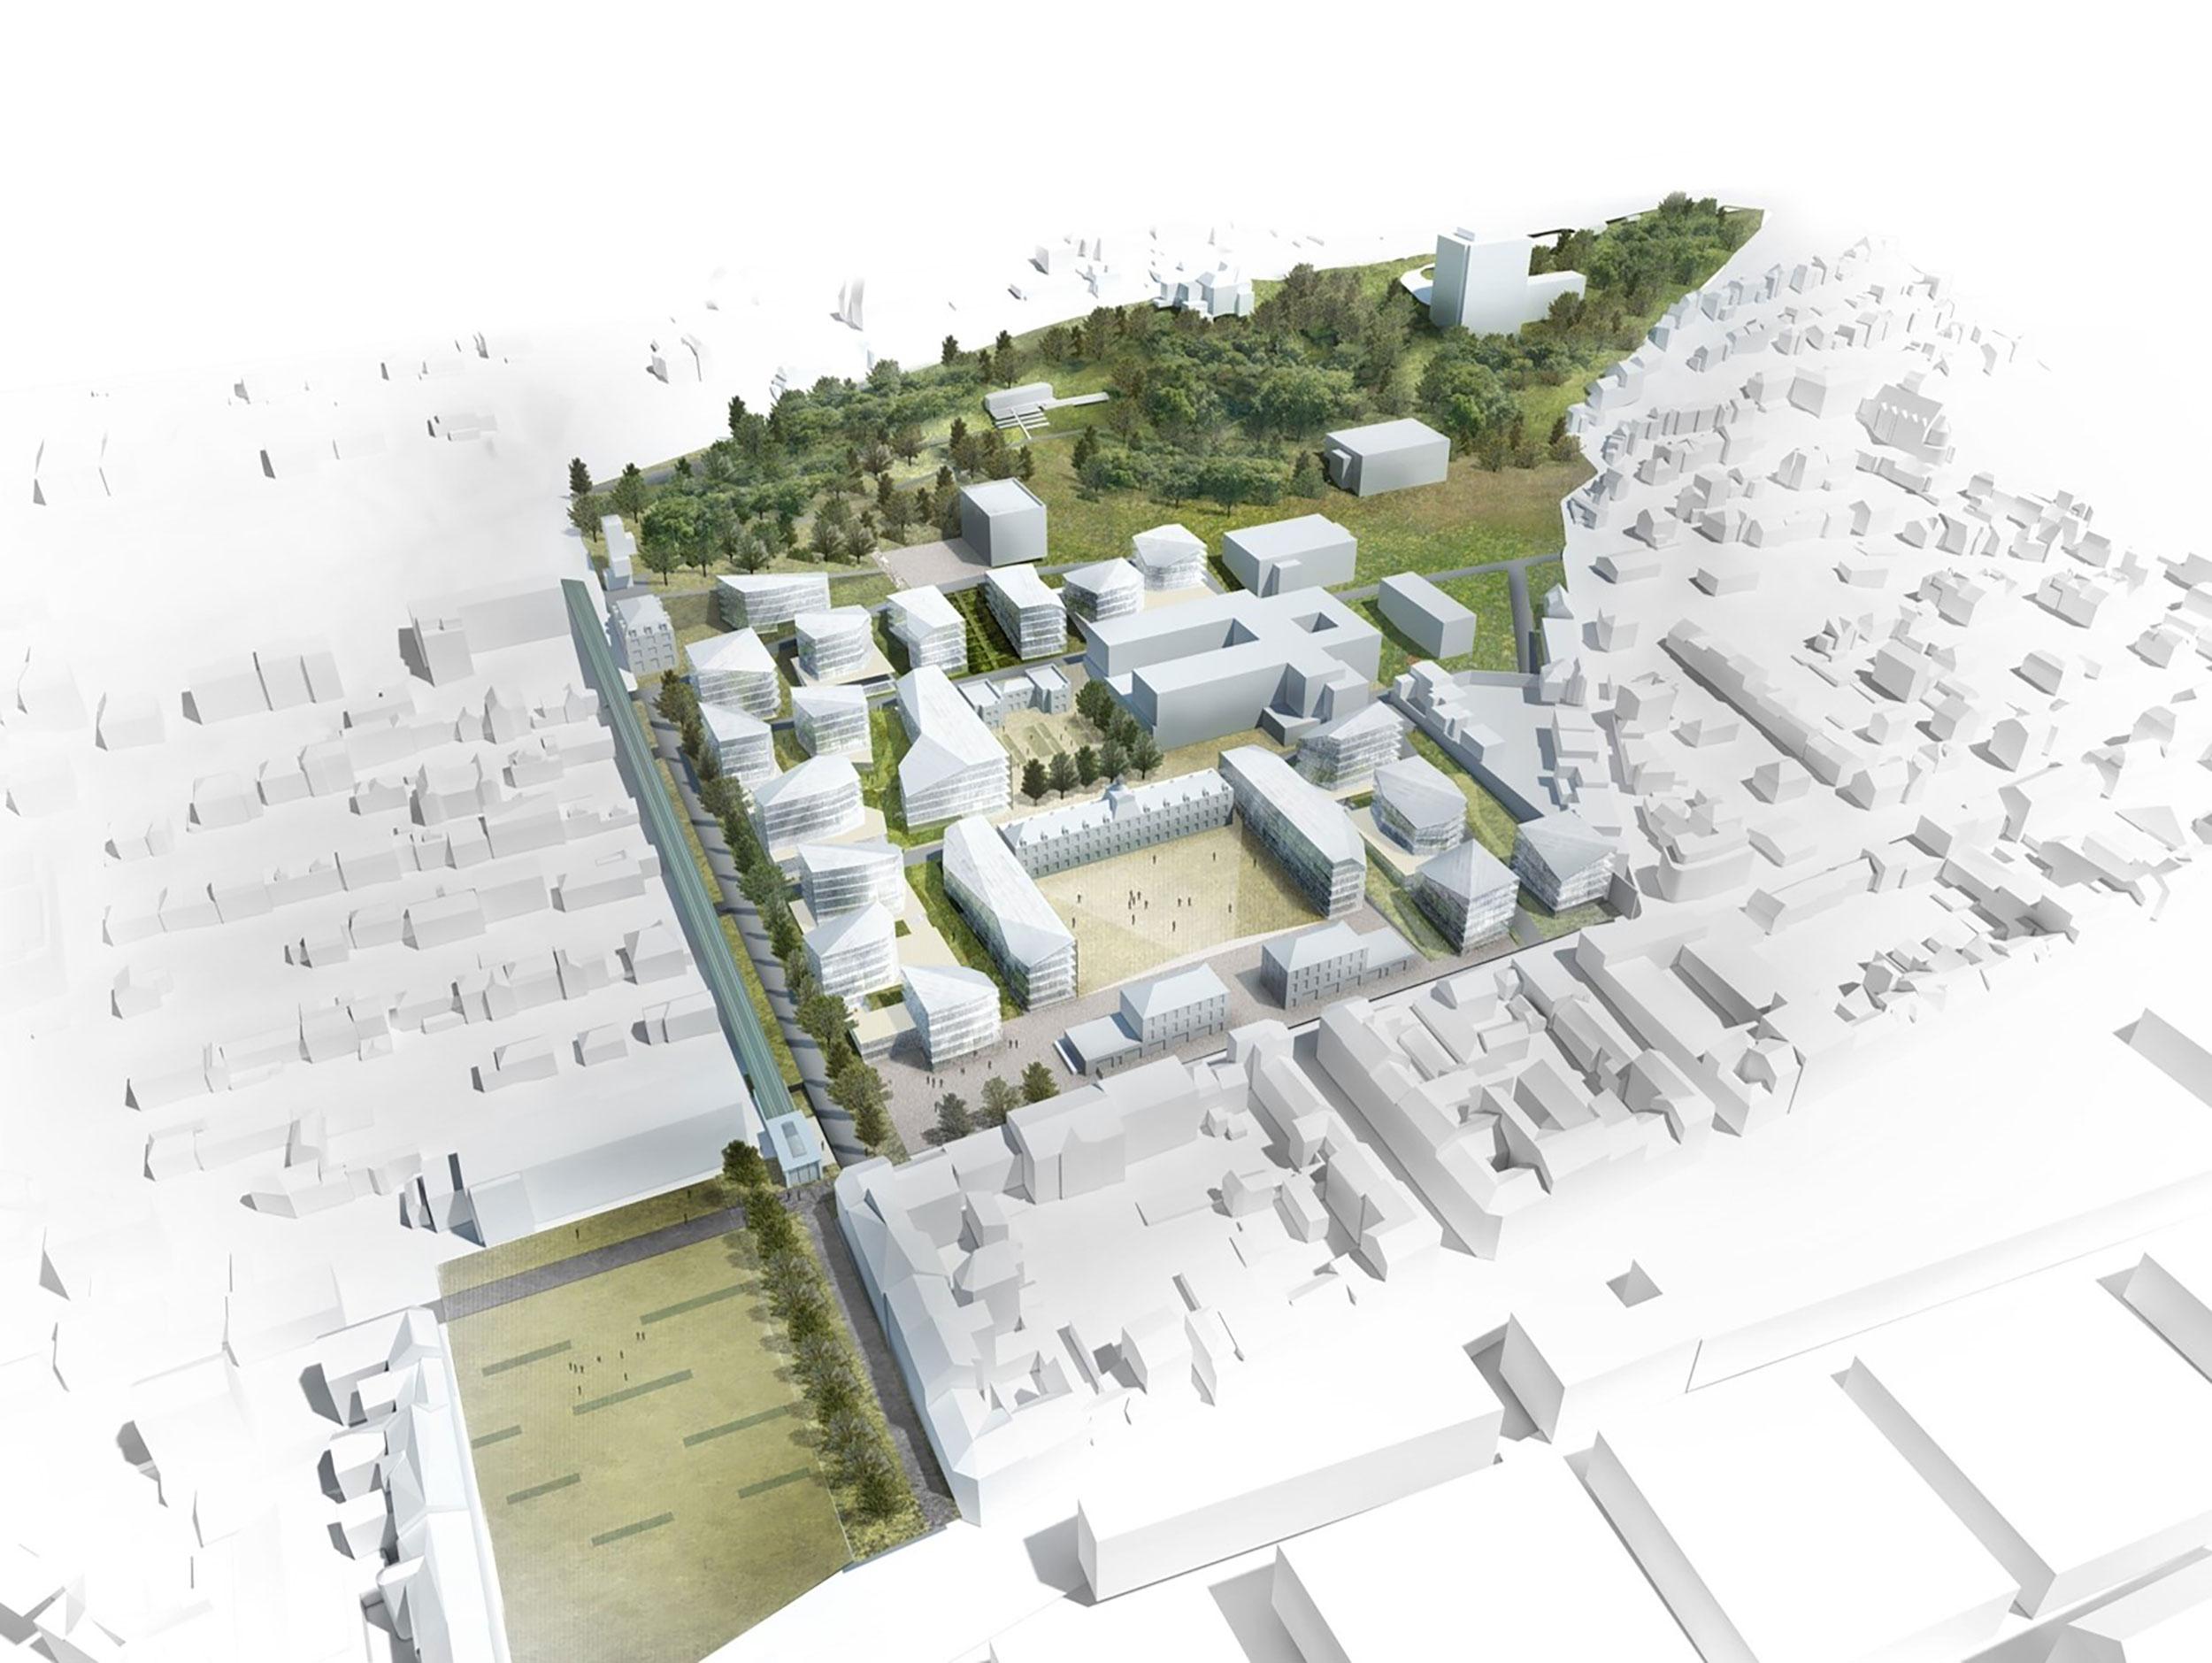 - Site Flaubert, Groupe Hospitalier du Havre